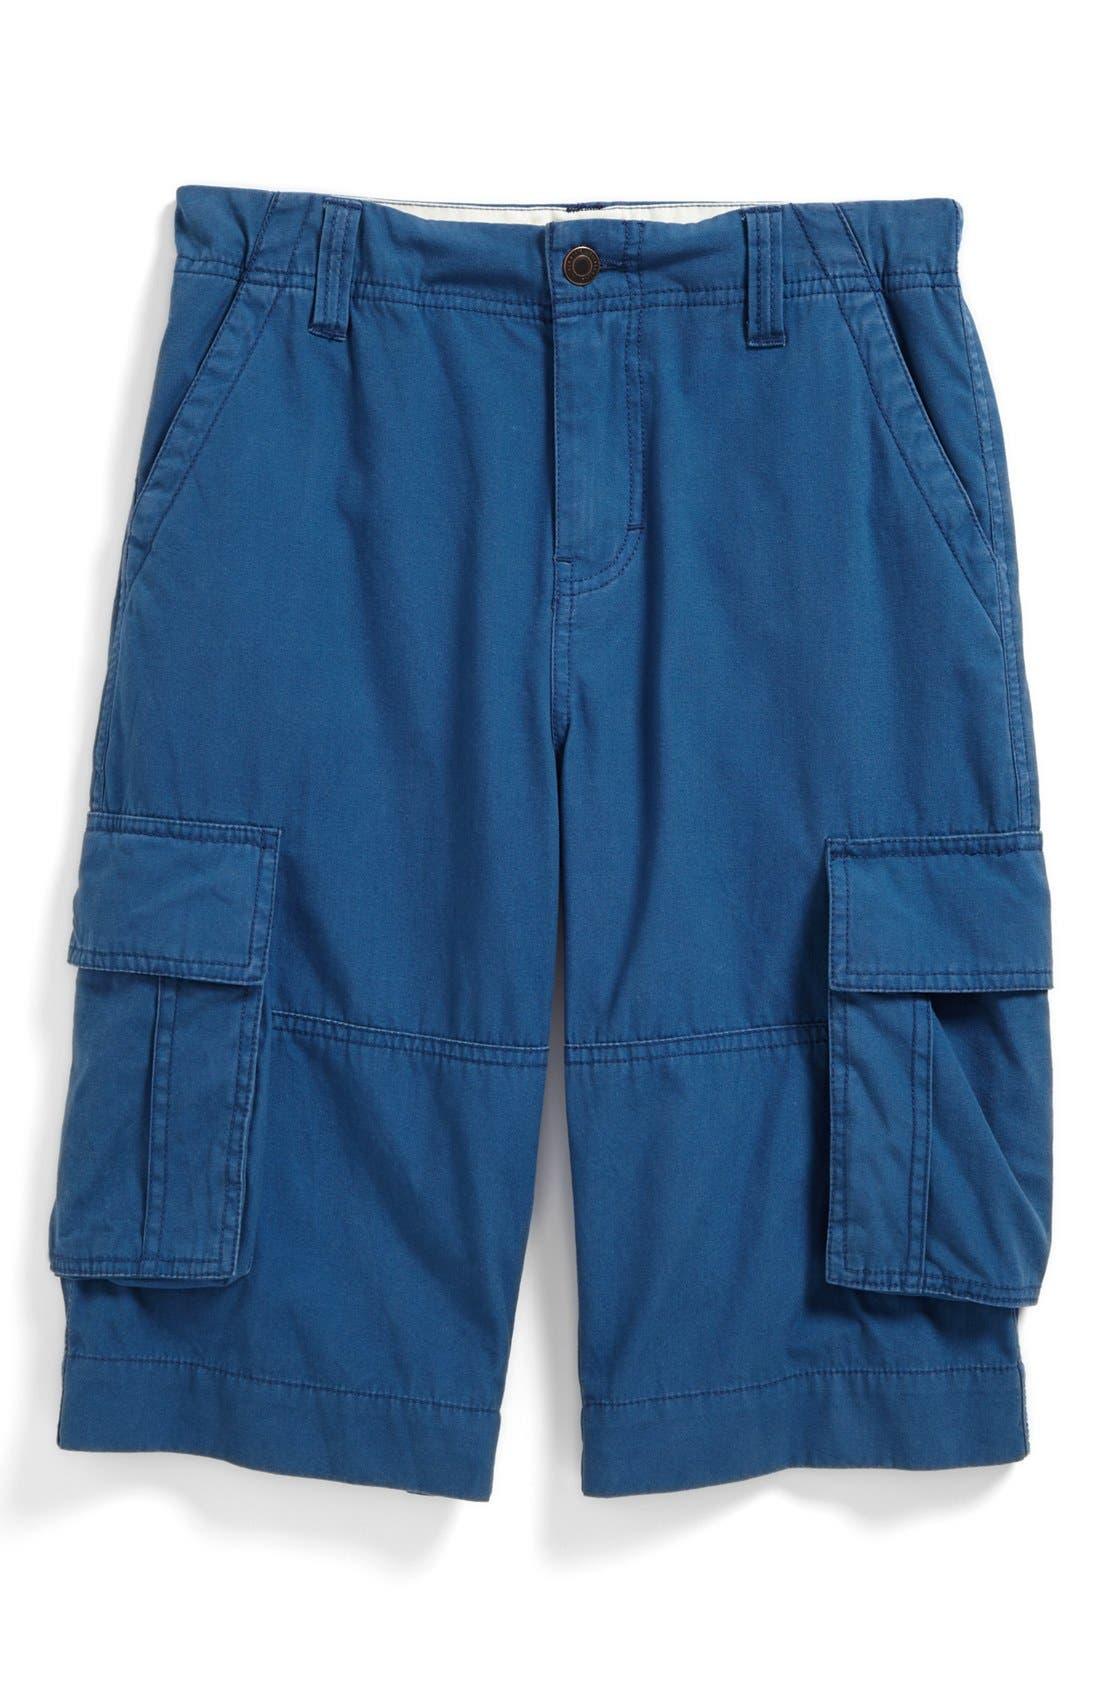 Alternate Image 1 Selected - Tucker + Tate Cargo Shorts (Big Boys)